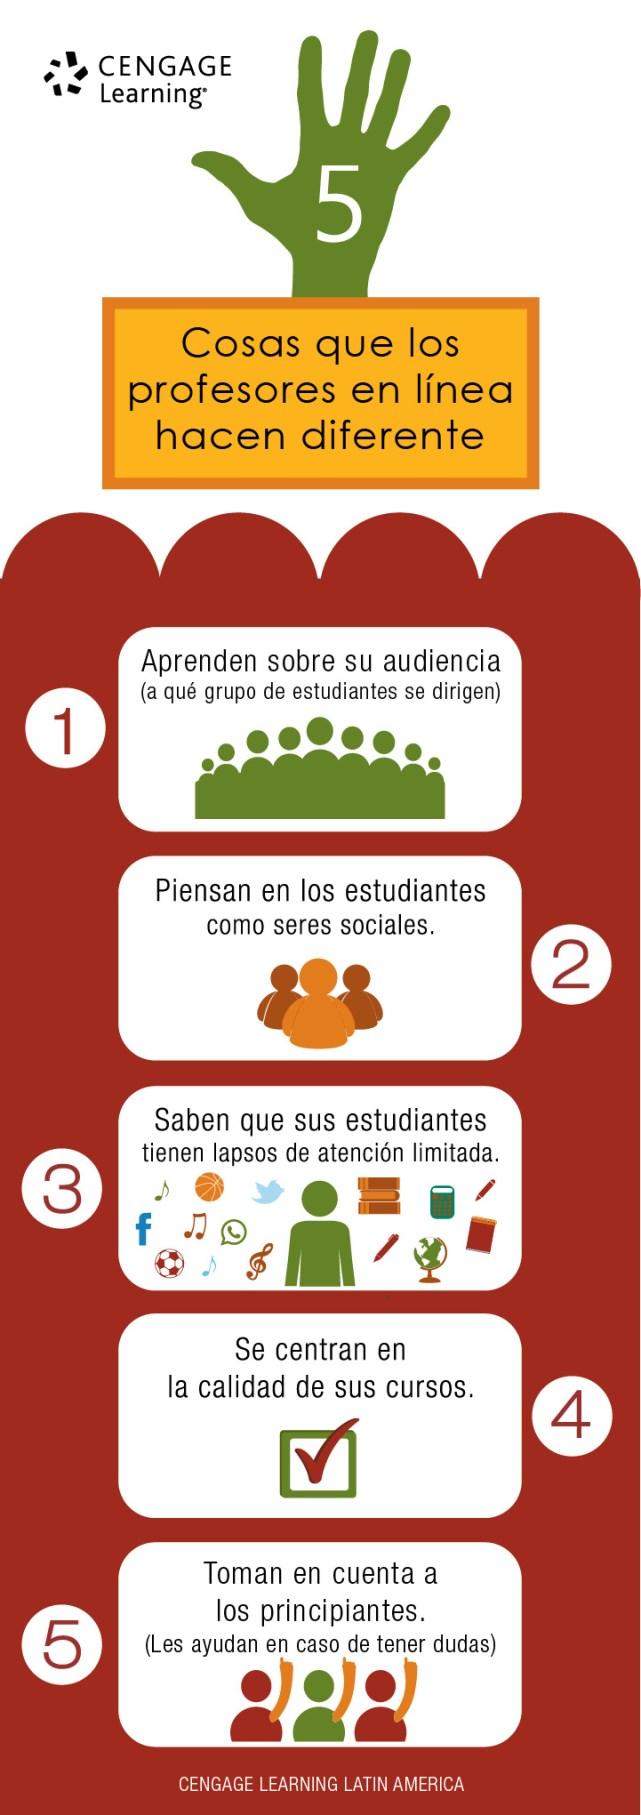 Infografia semana 2 Cengage mx